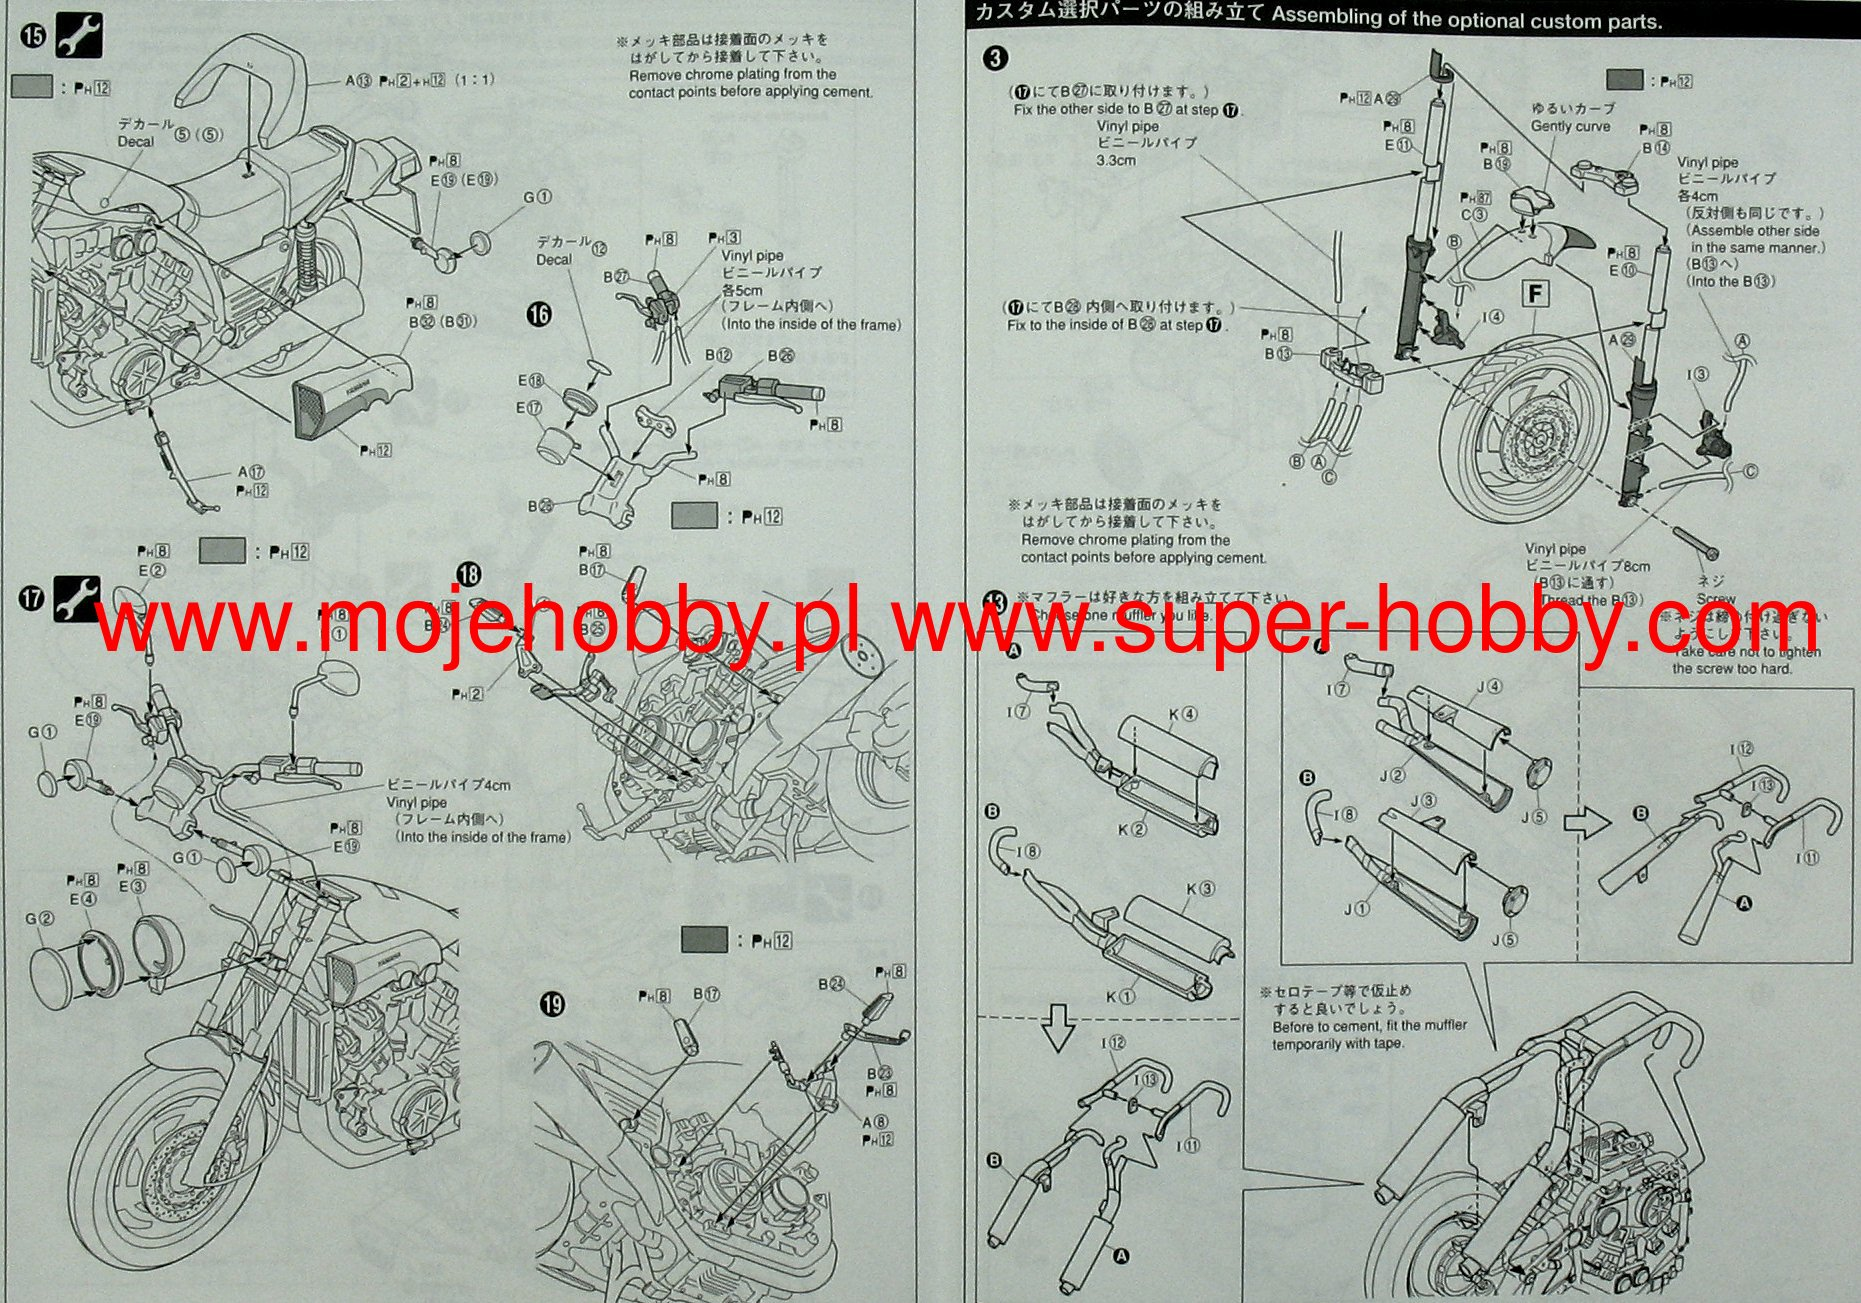 Yamaha Vmax with Custom Parts